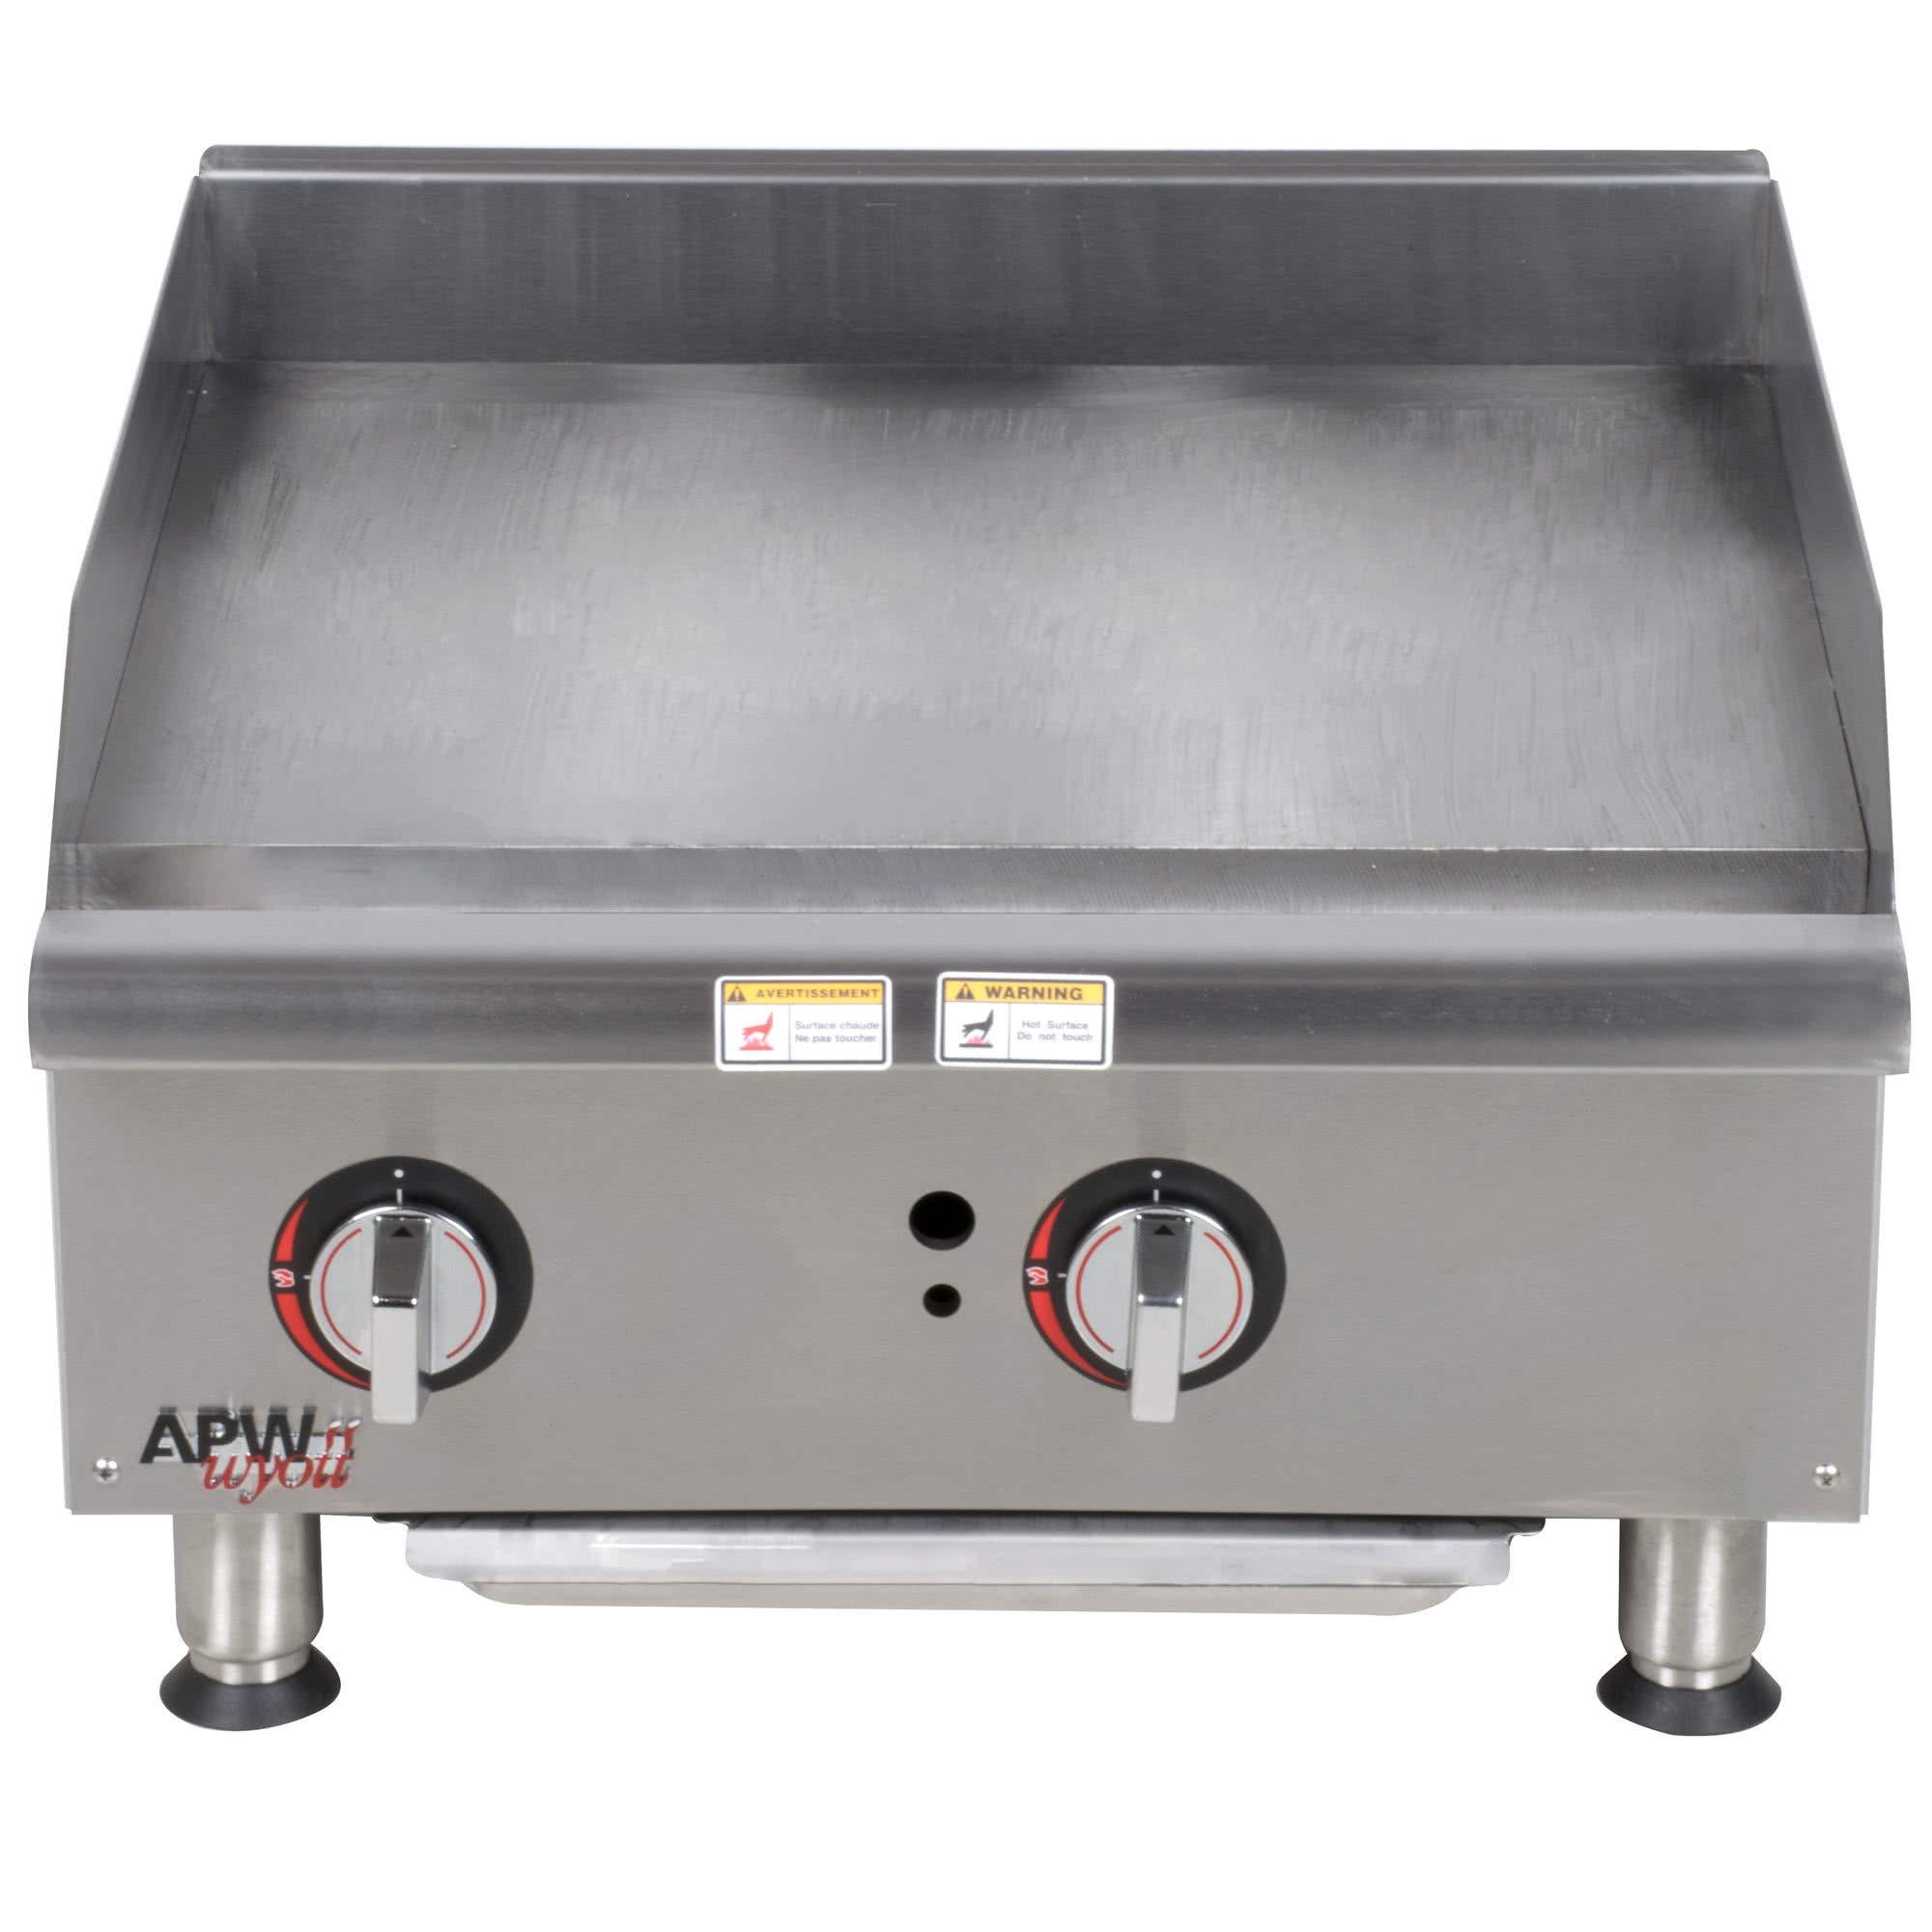 TableTop King GGM-24i 24'' Countertop Griddle - 50,000 BTU